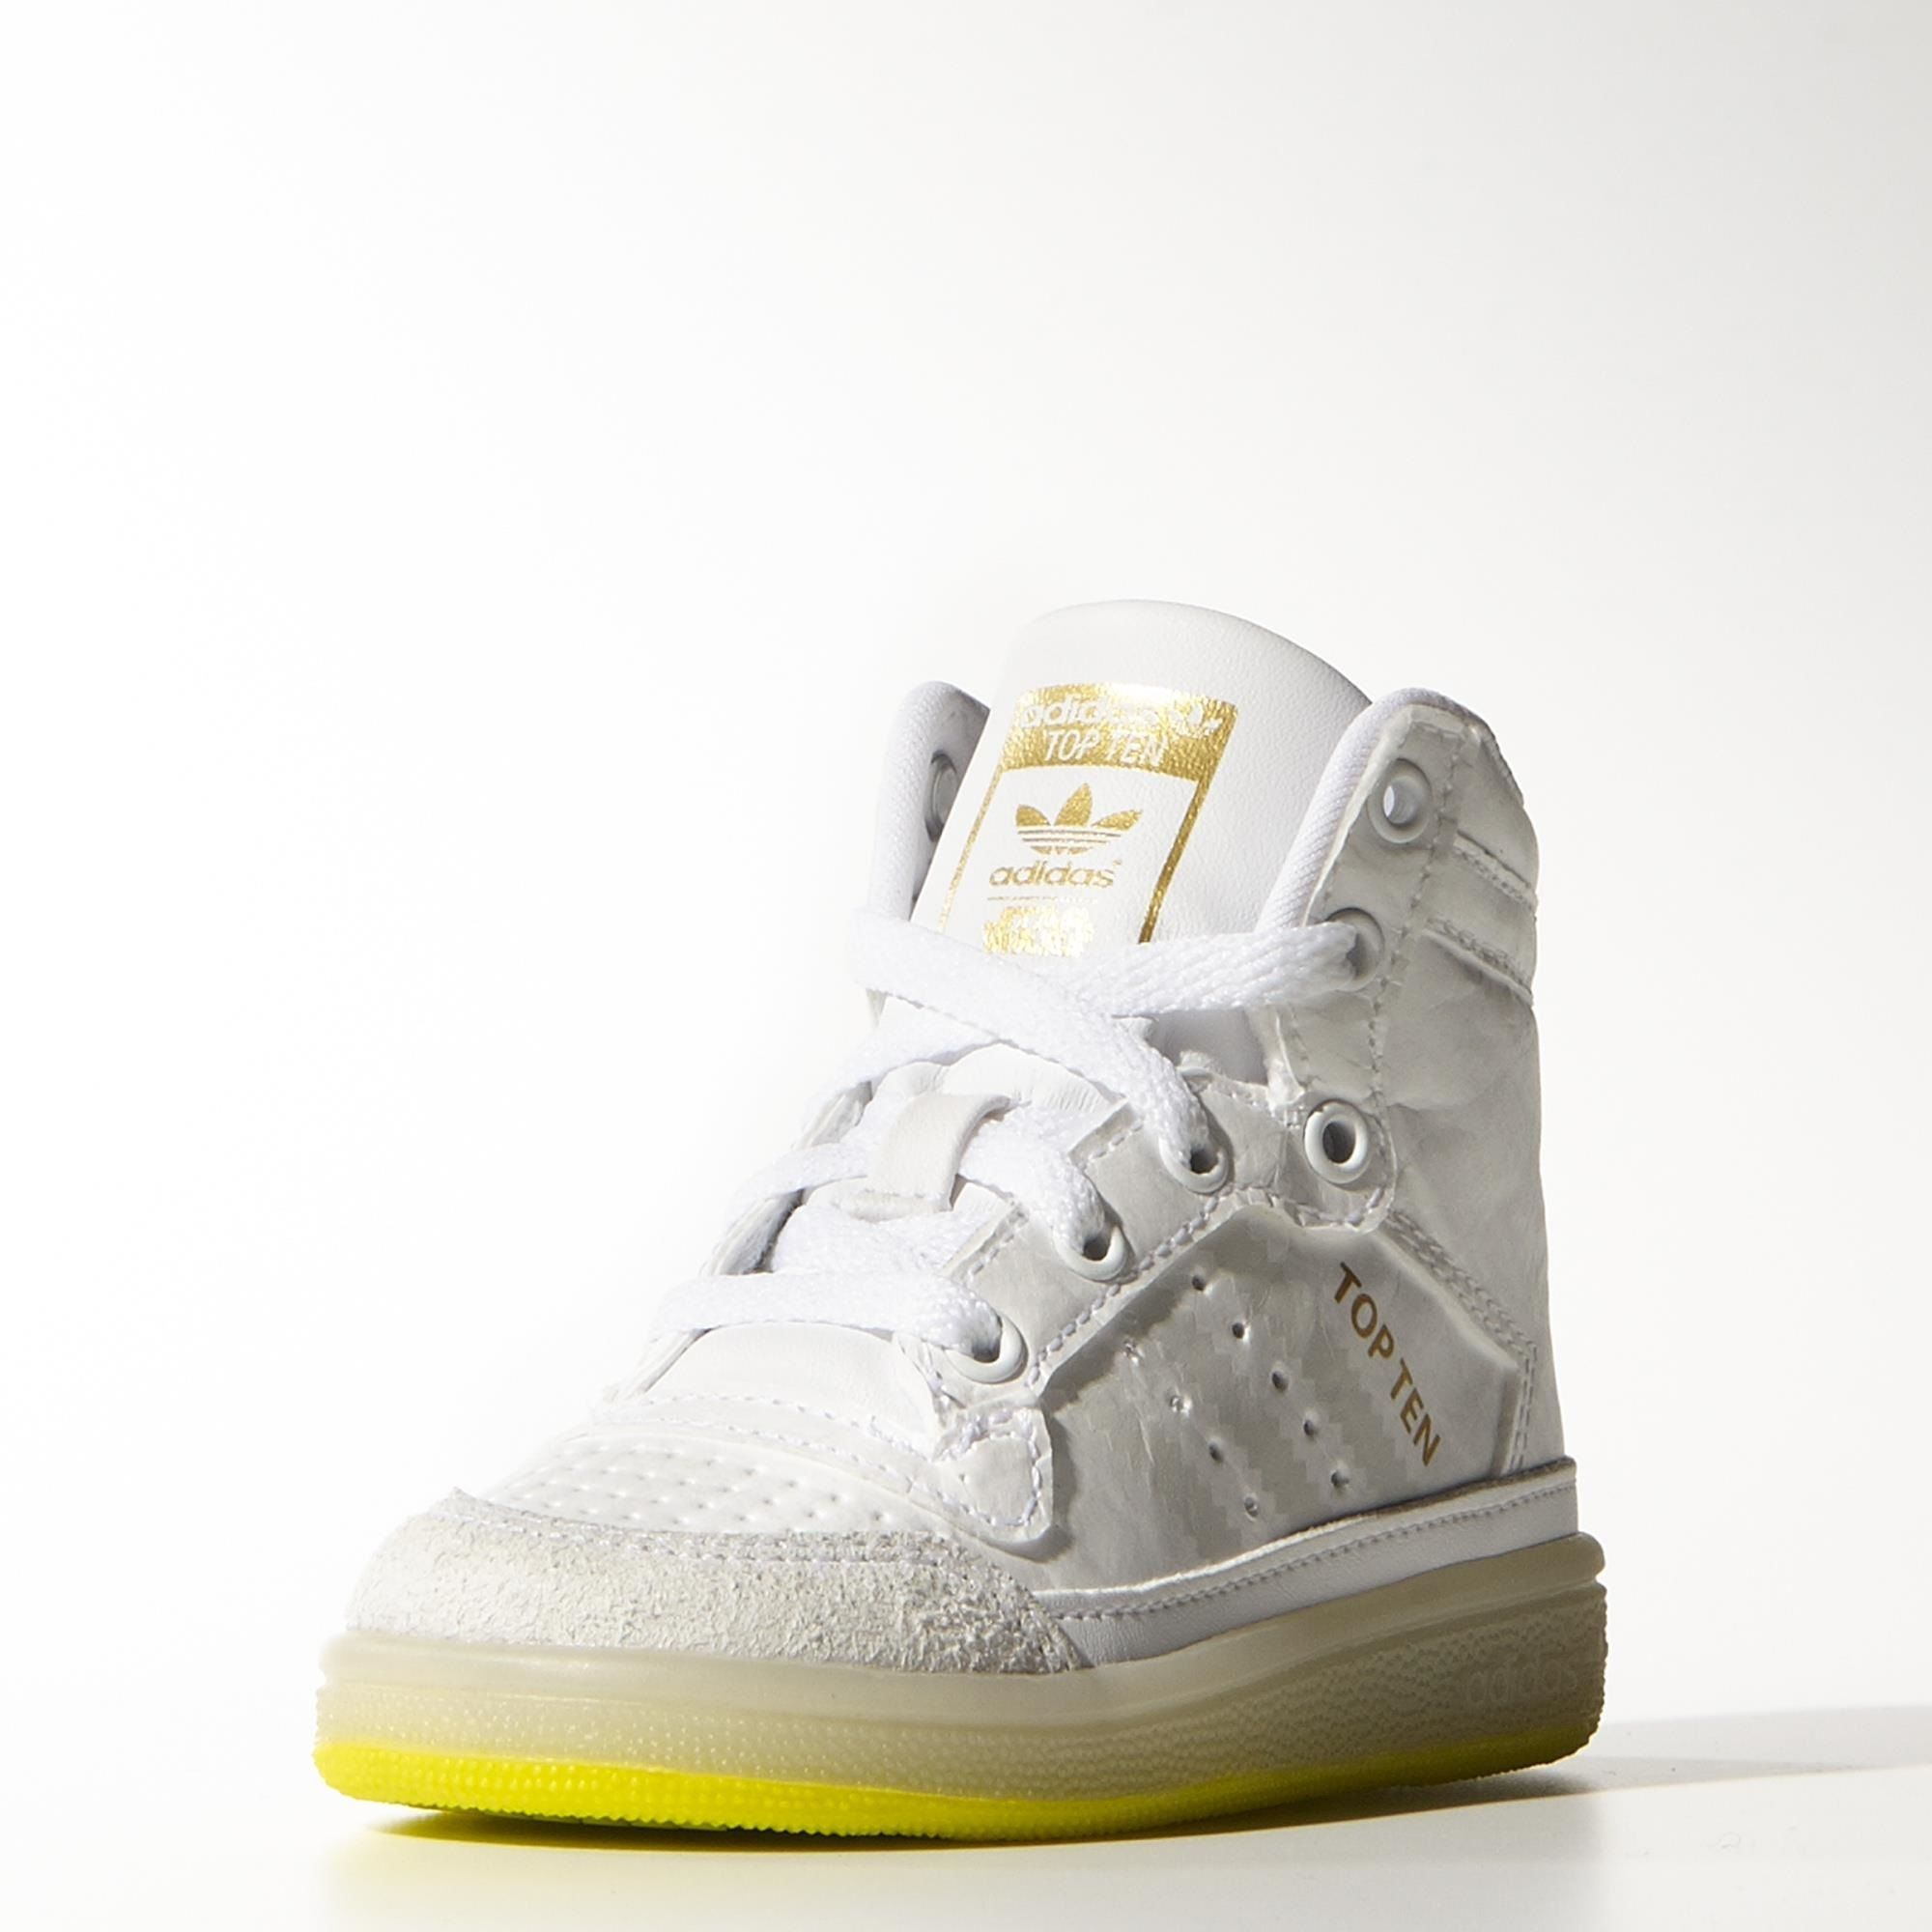 official photos 237a5 7df9c adidas - TOP TEN HI YODA I- hight top snickers kids